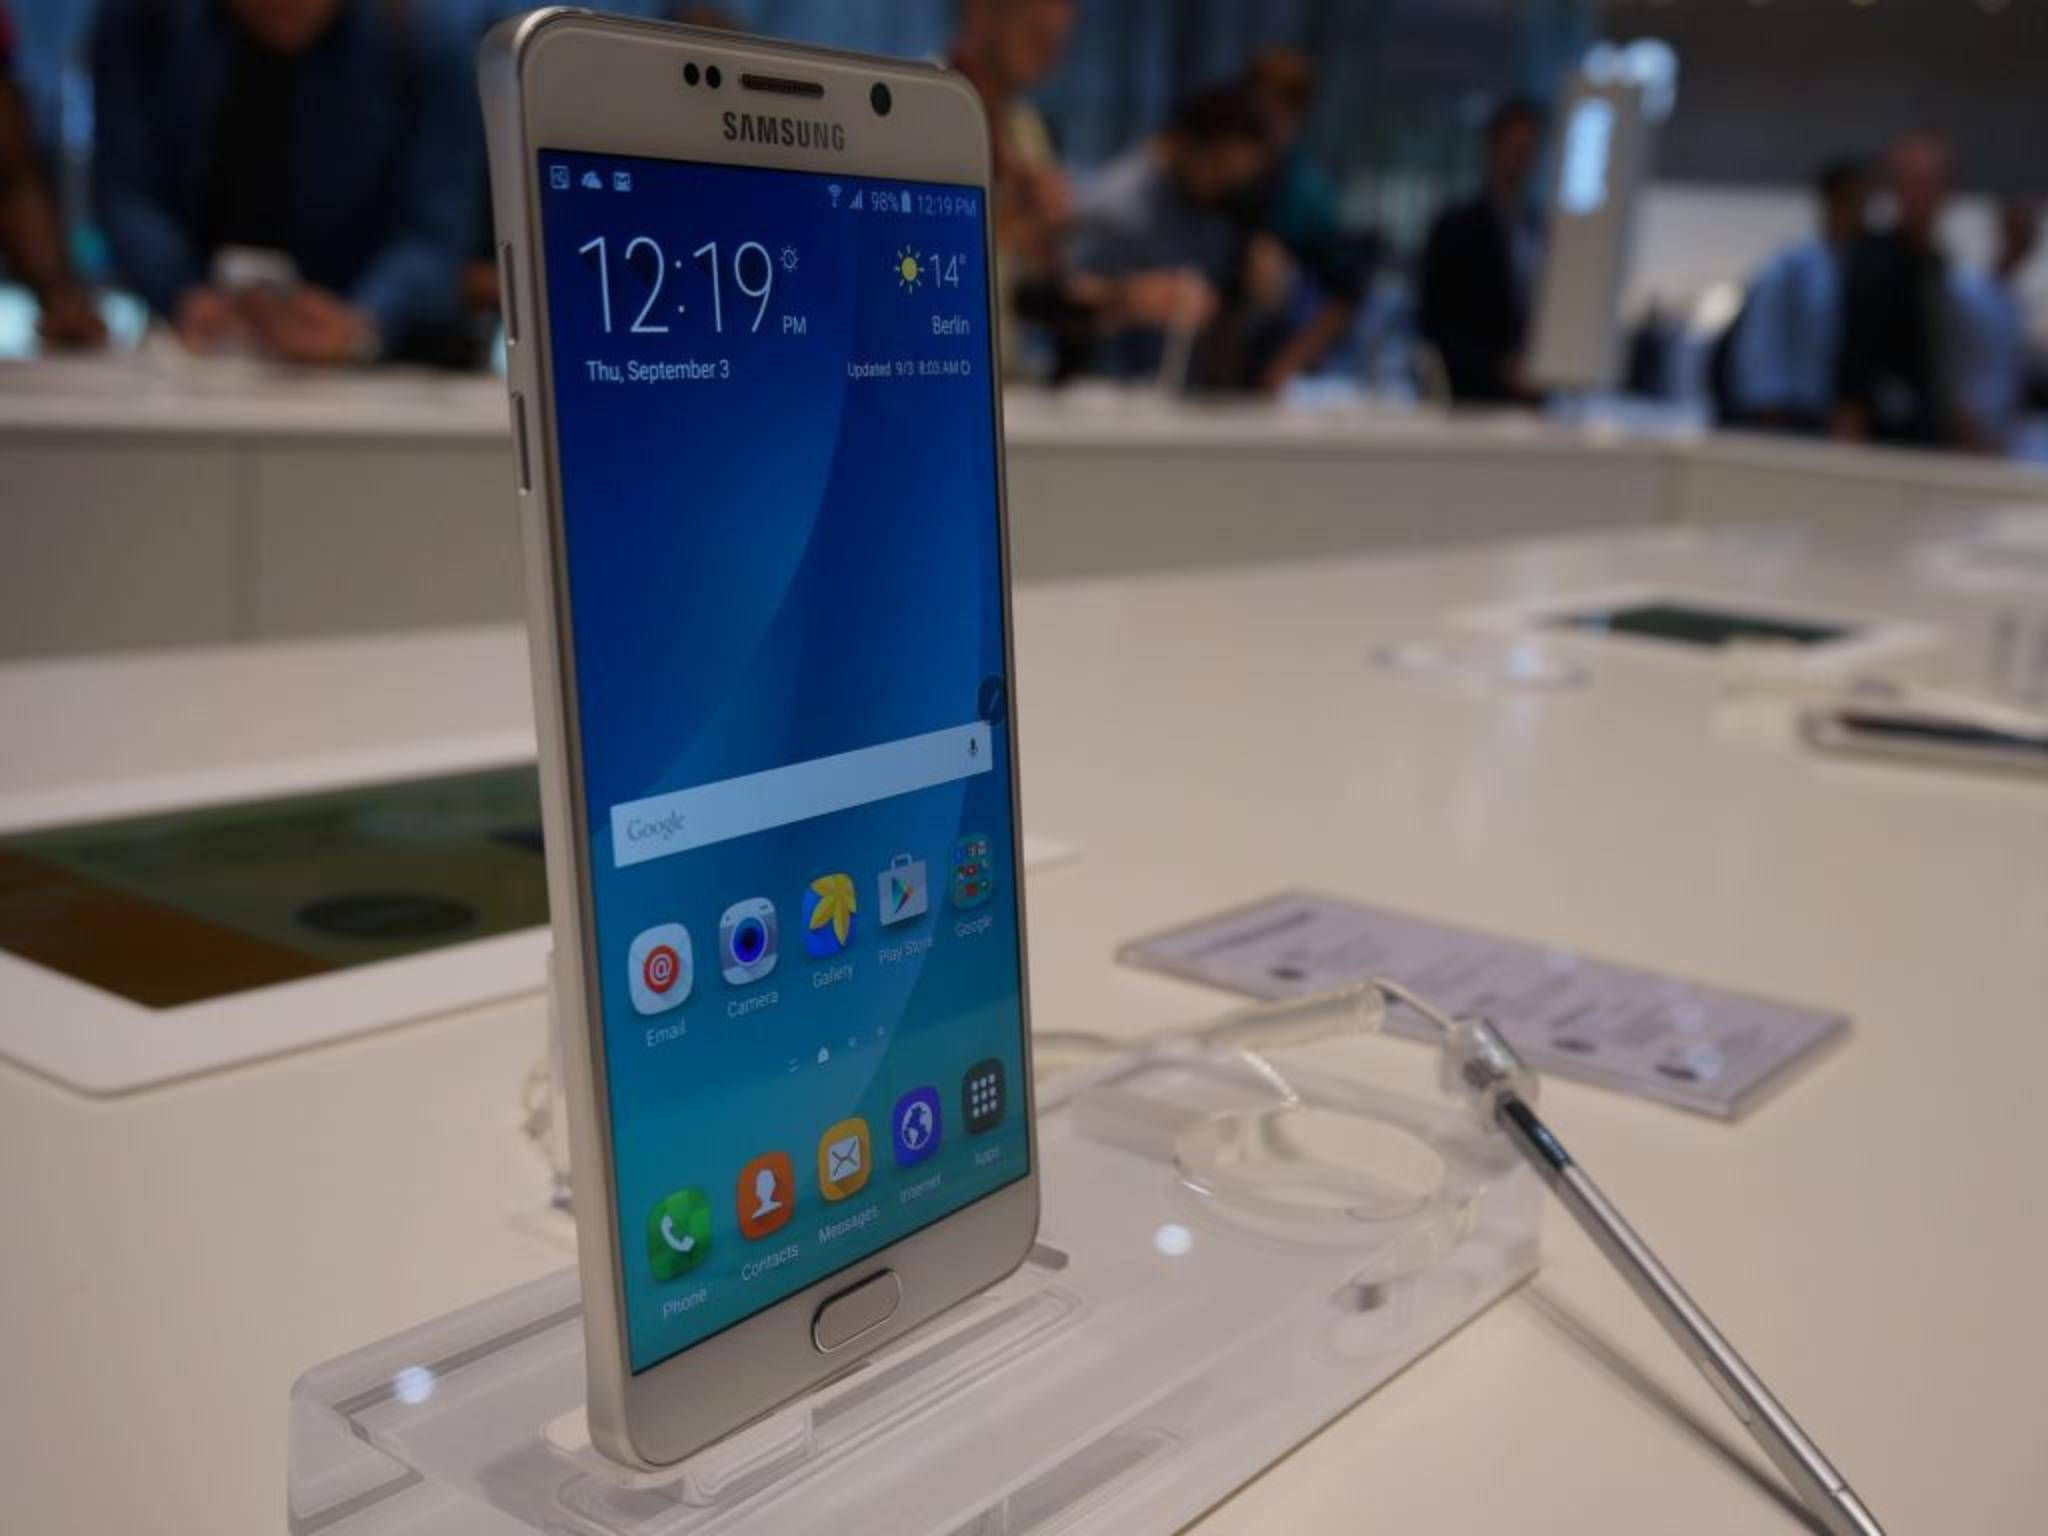 Samsung Galaxy Note 5 8